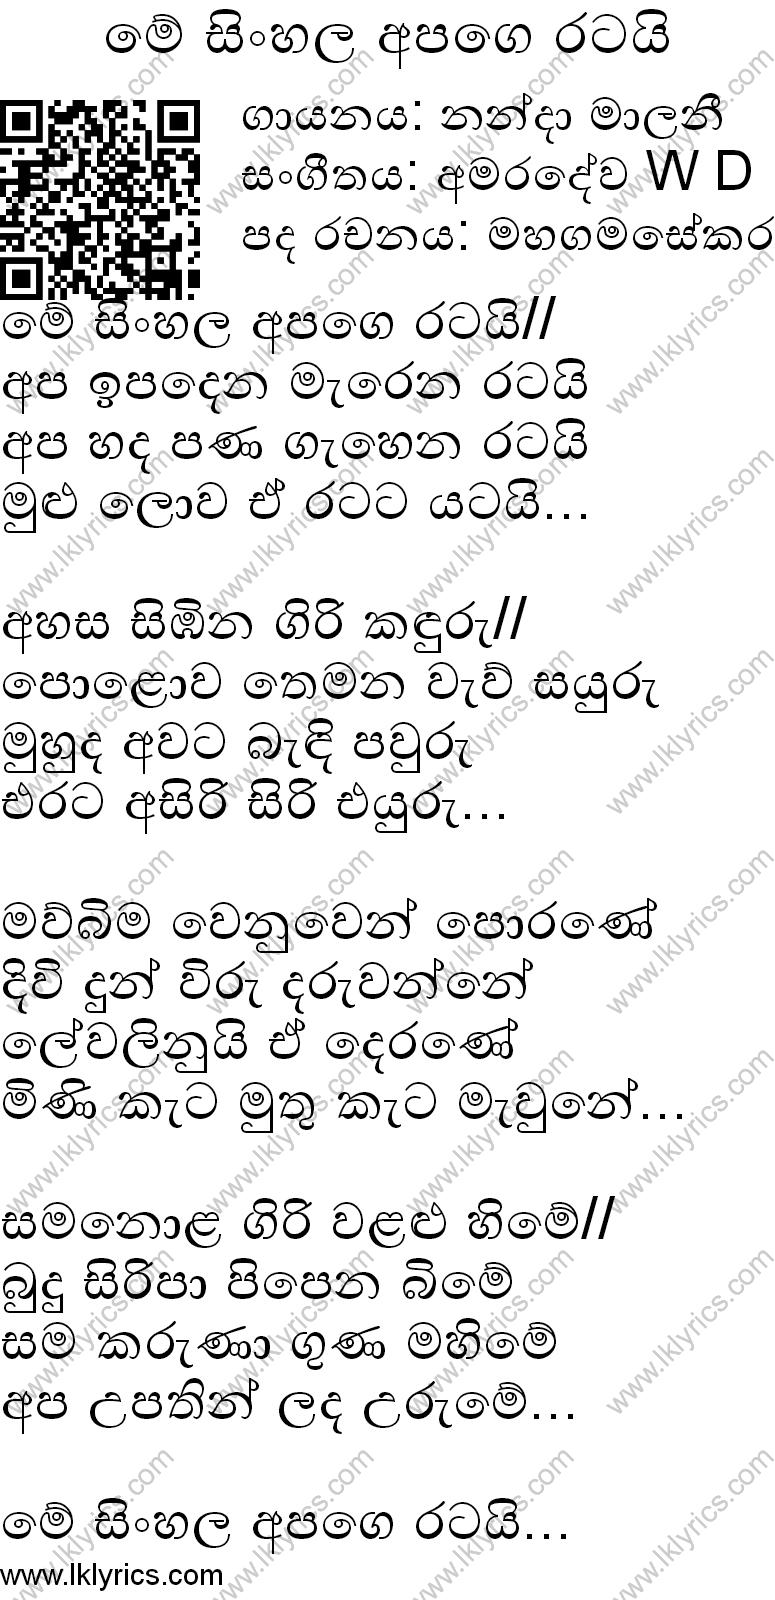 Welcome to Top Sinhala Mp3 - Free Sinhala MP3 Downloads